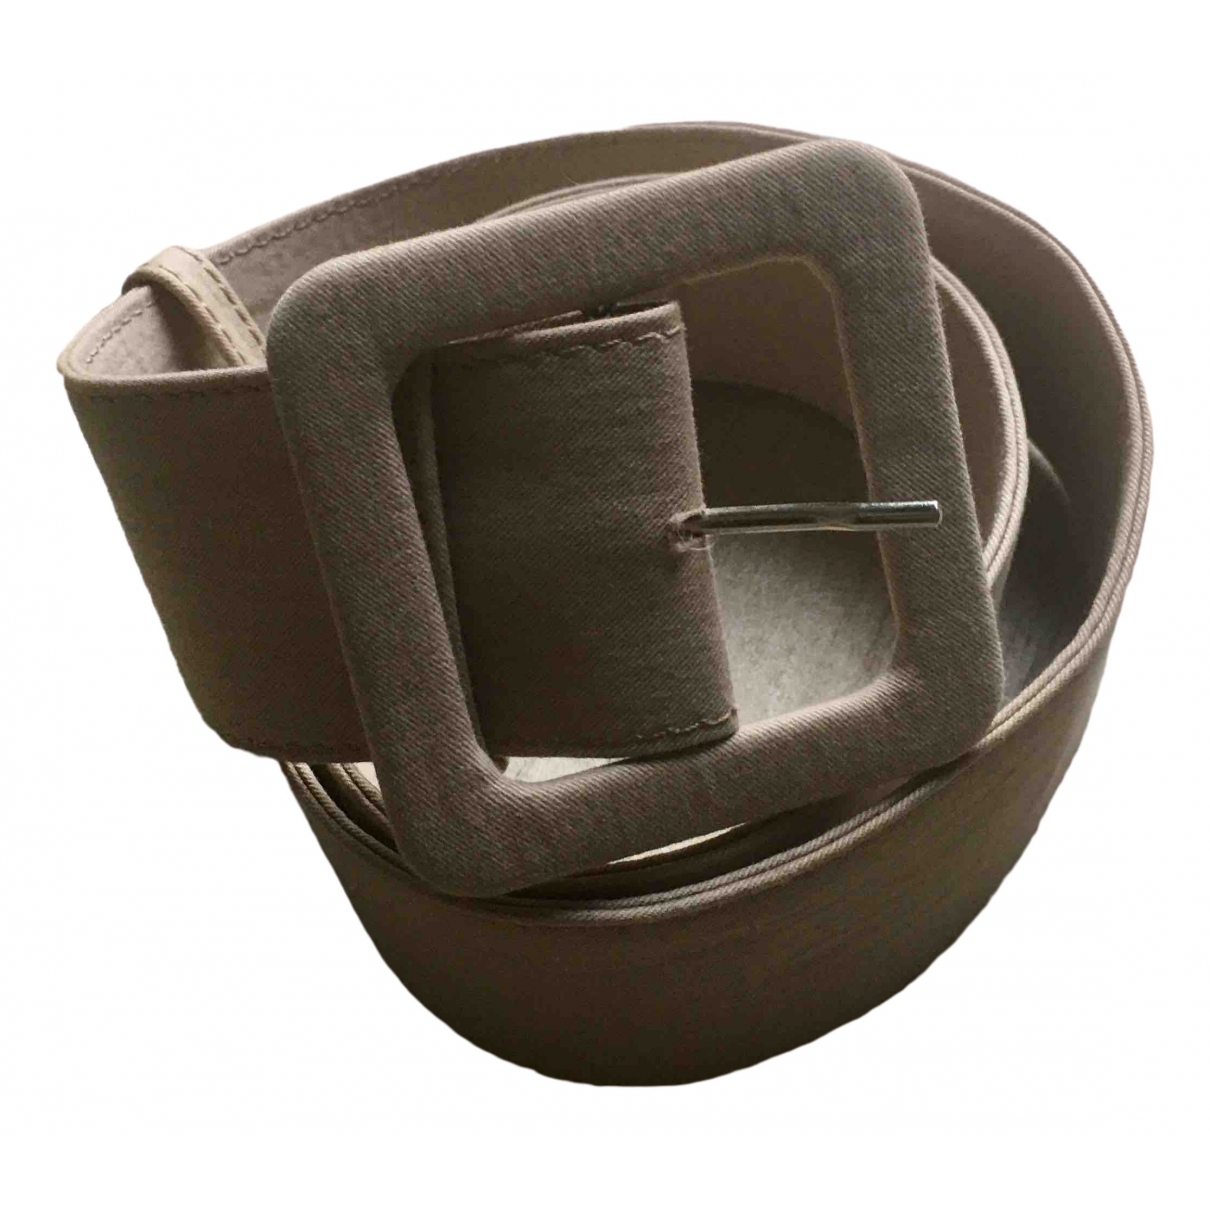 Marni \N Beige Cloth belt for Women M International